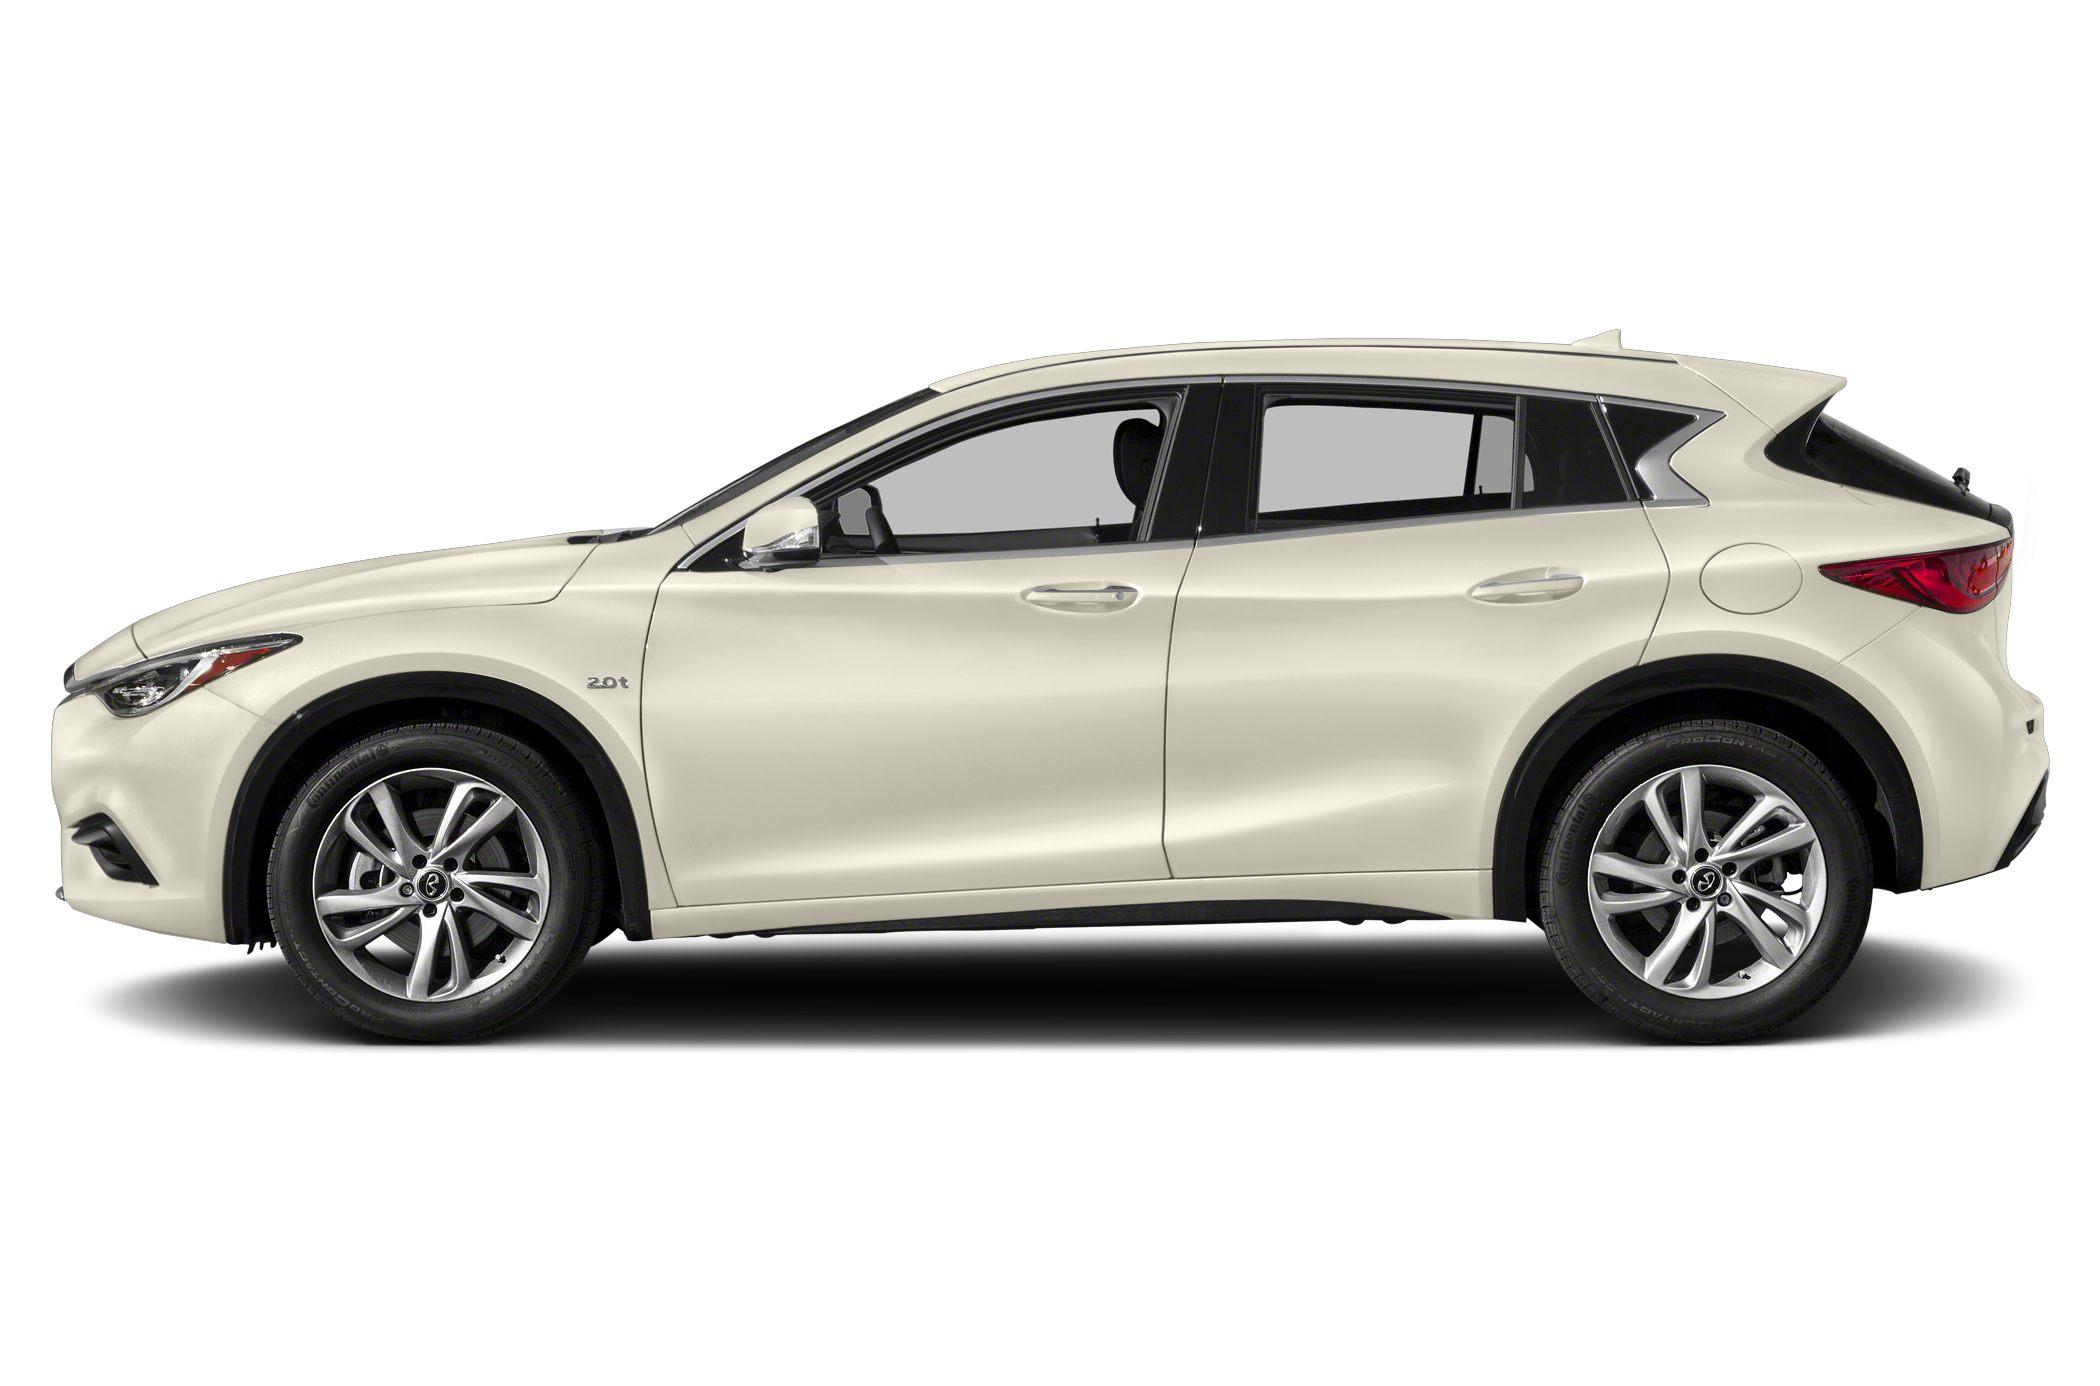 2018 Infiniti Qx30 Prices >> 2018 INFINITI QX30 Reviews, Specs and Prices | Cars.com